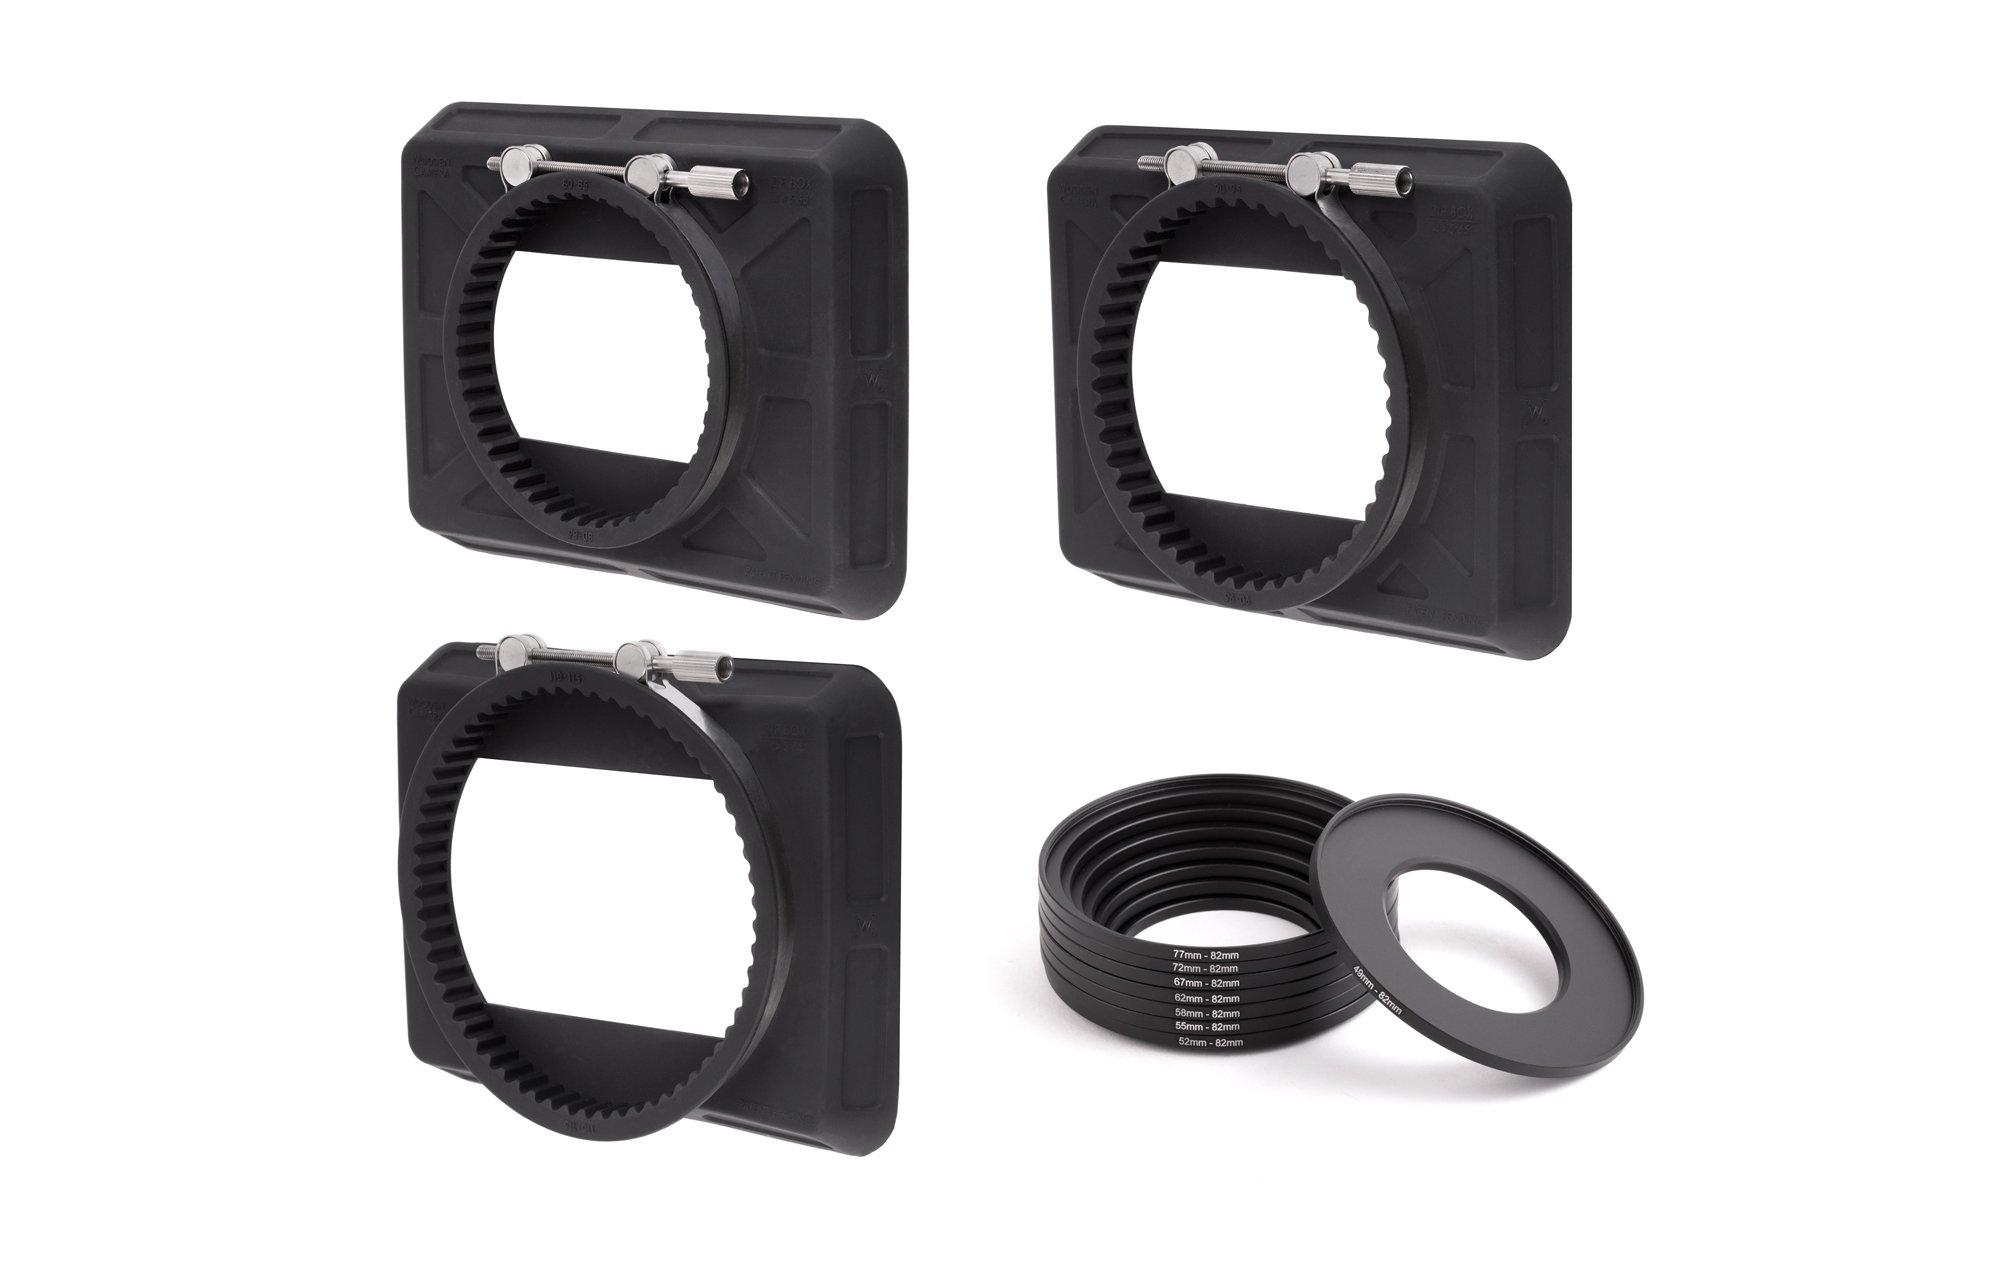 Wooden Camera - Zip Box Kit 4x5.65 (80-85mm, 90-95mm, 110-115mm, Adapter Rings)